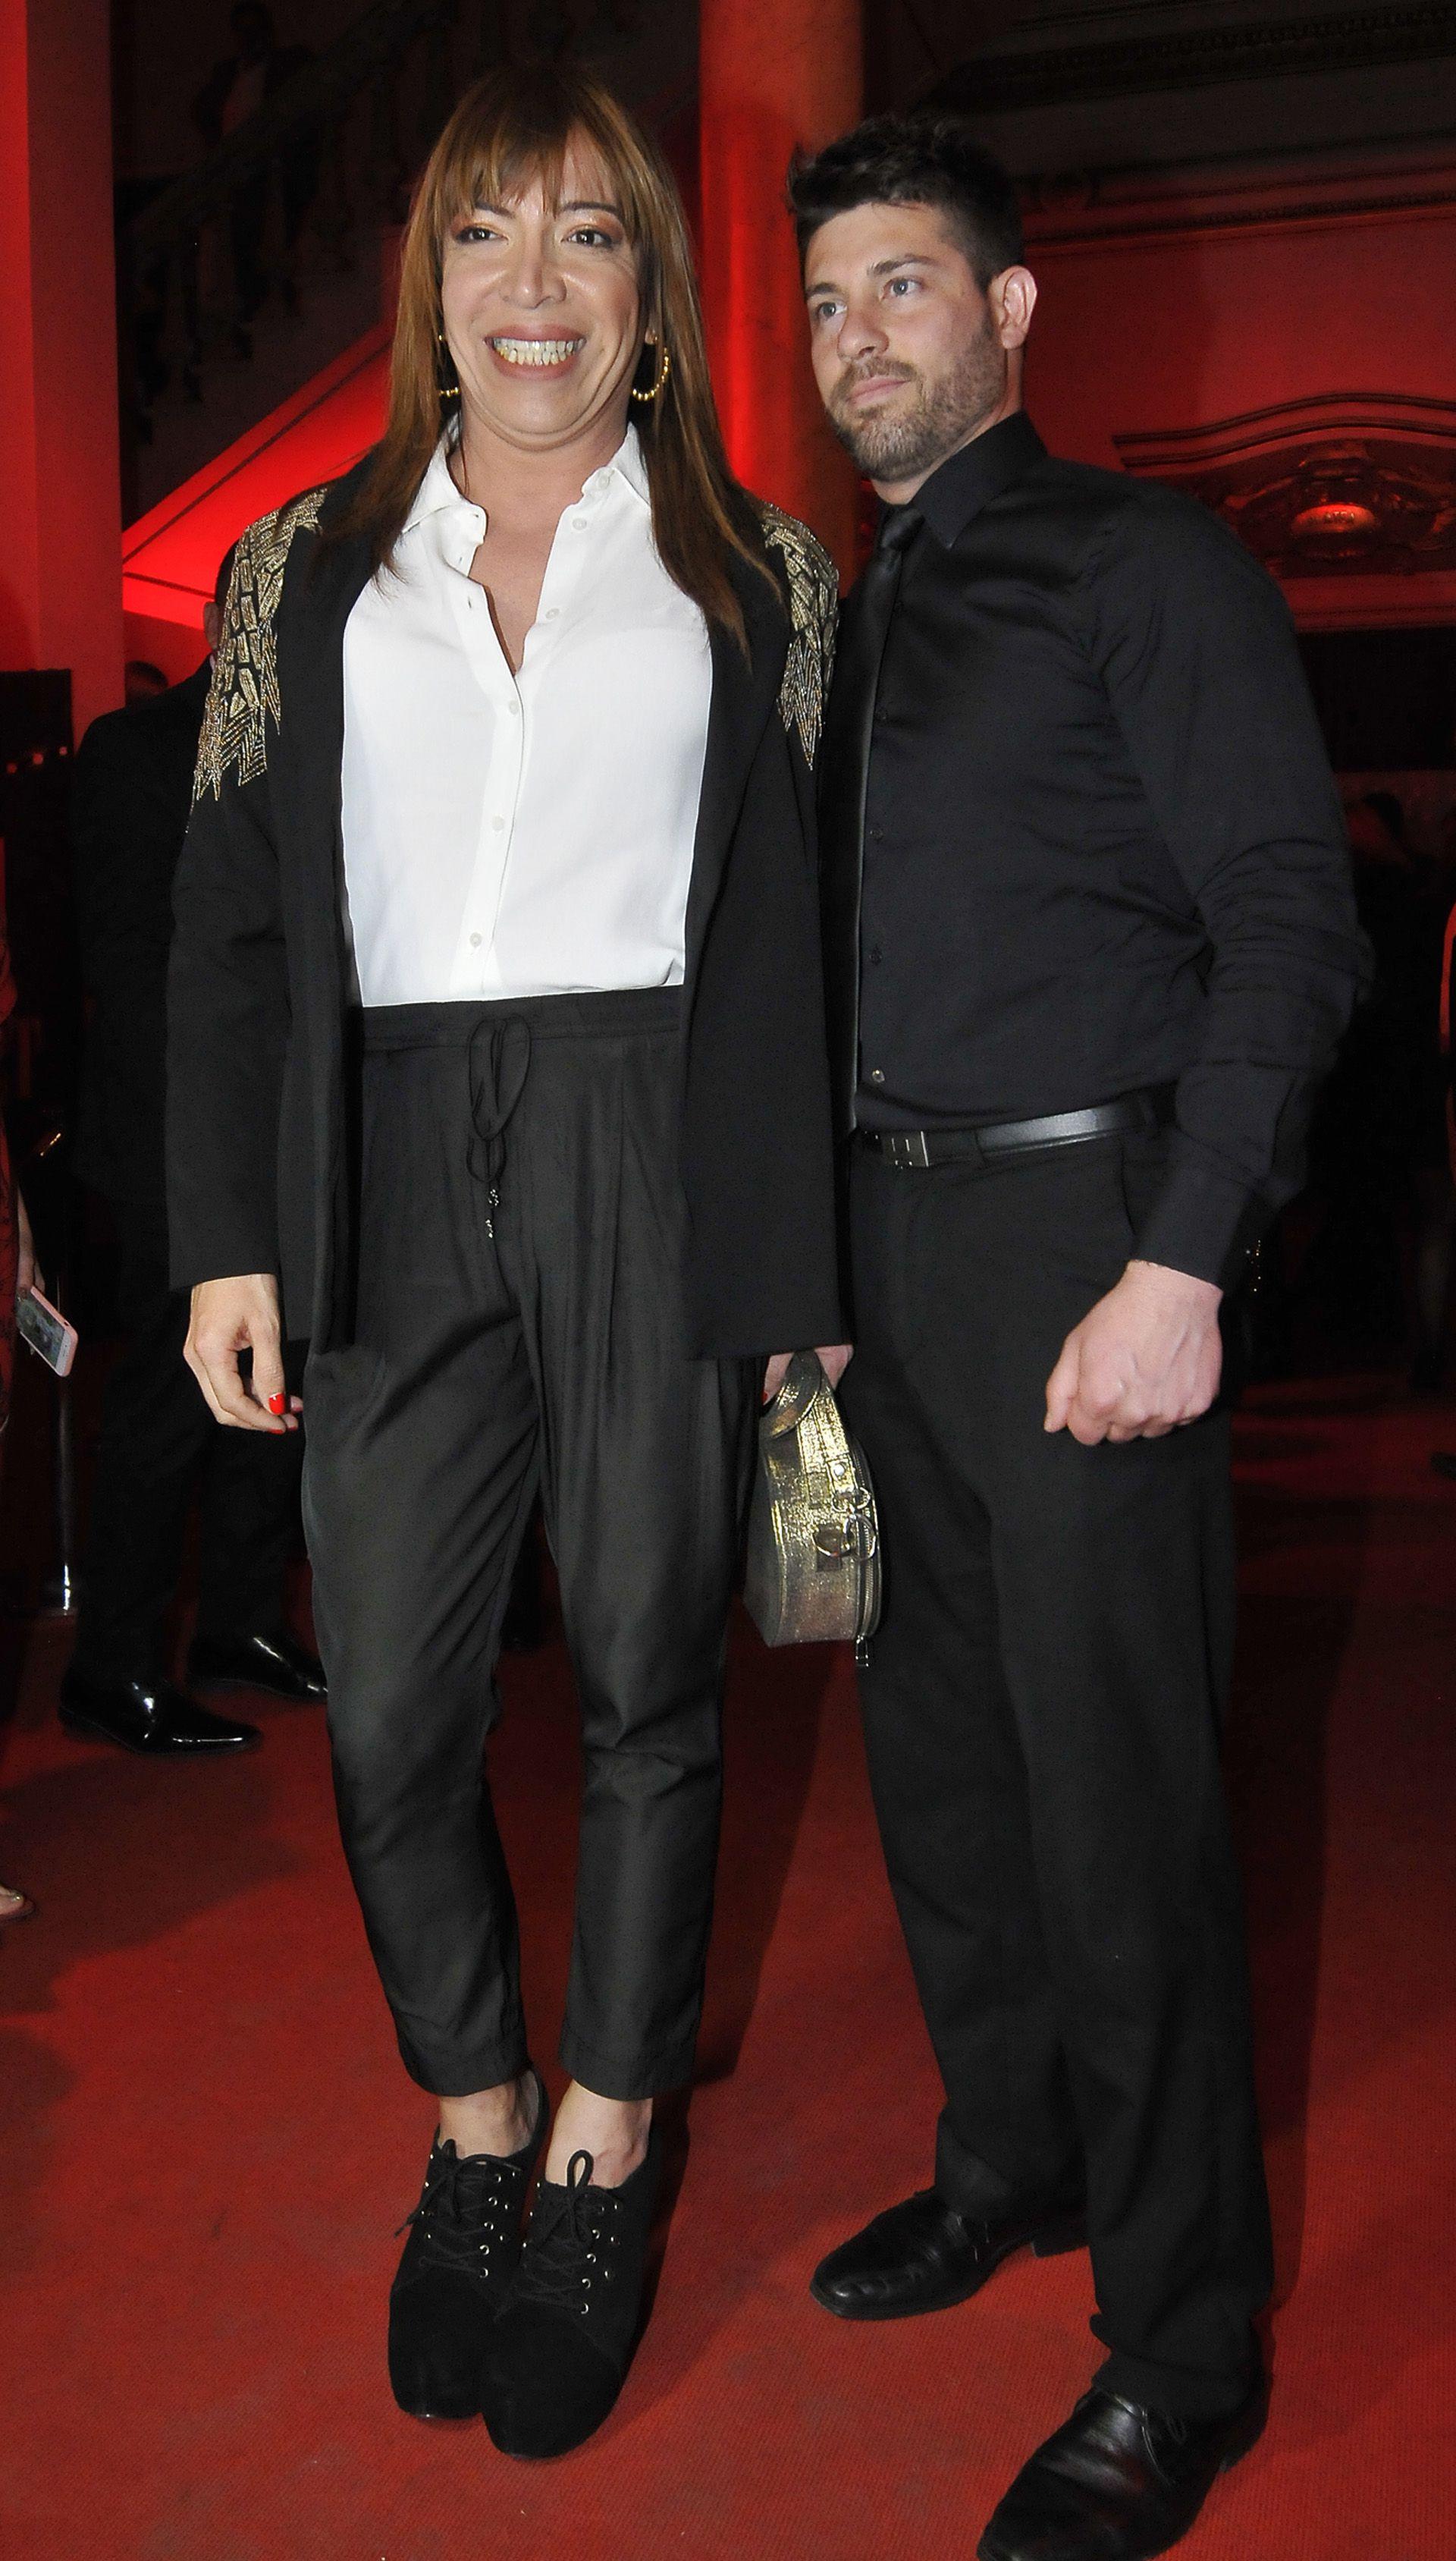 Lizy Tagliani y Leo Alturria (Crédito: Teleshow)